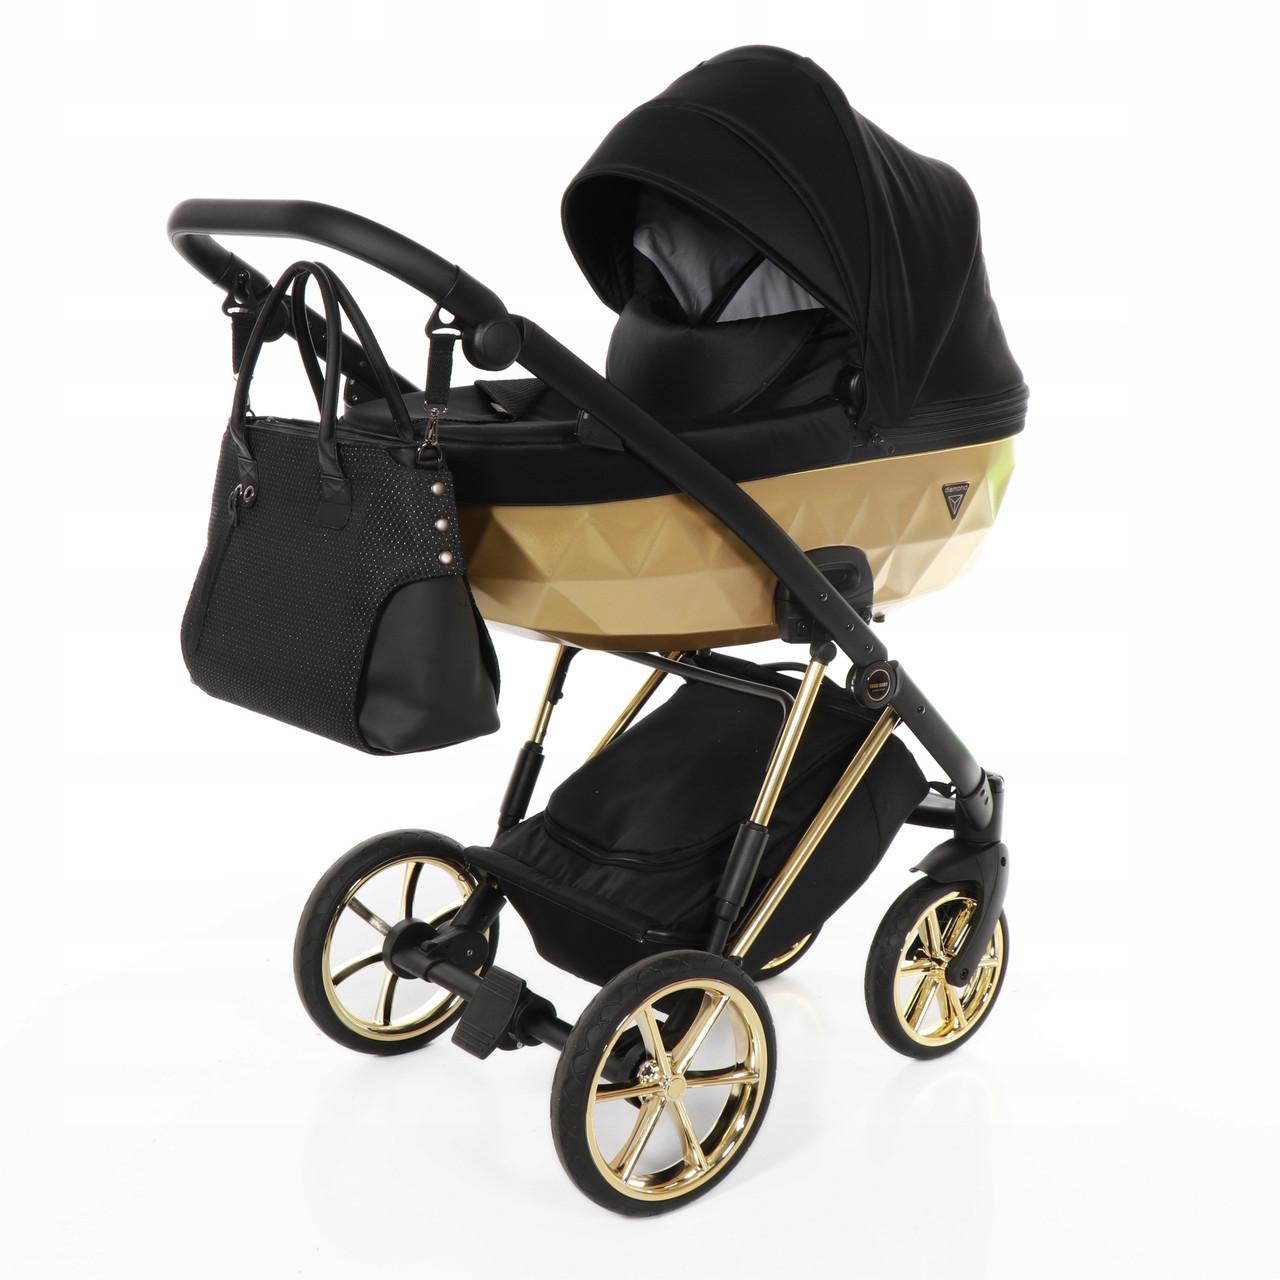 Дитяча коляска 2 в 1 Junama Diamond V-Plus 03